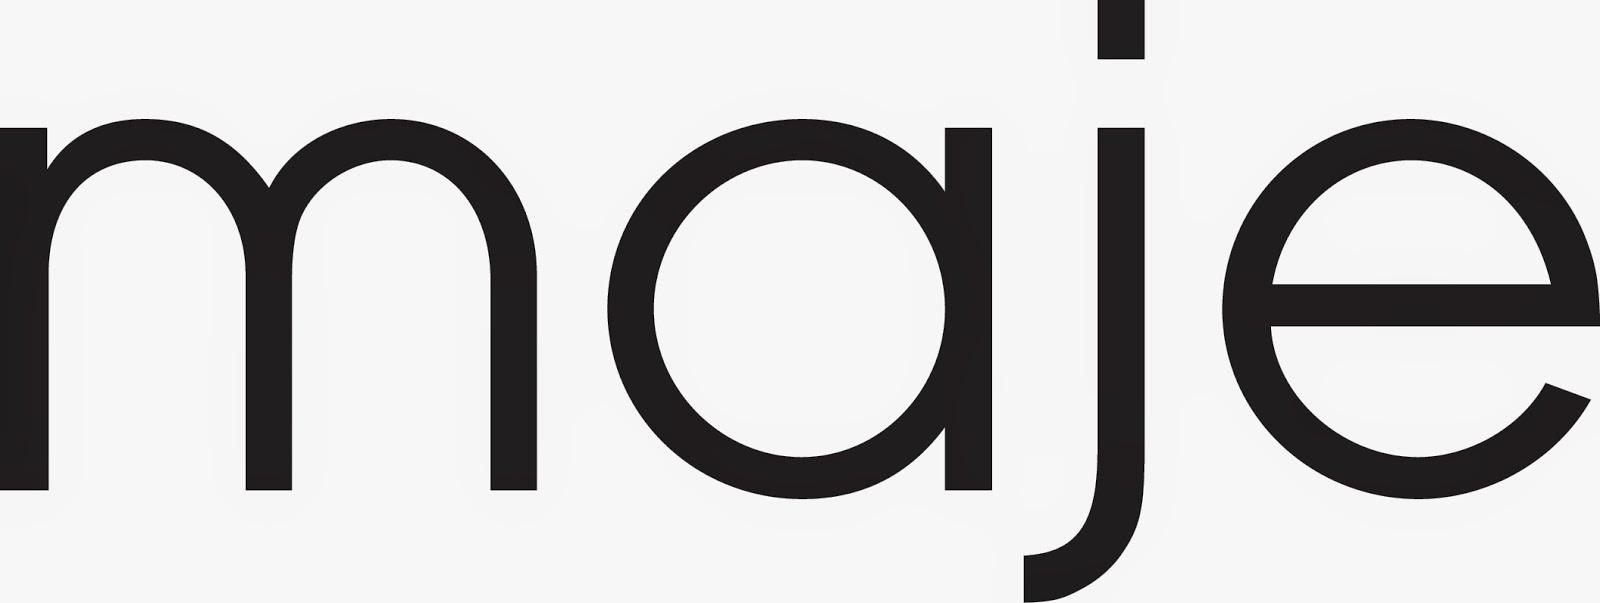 le magasin d usine stock maje paris 6e les magasins d 39 usine en france. Black Bedroom Furniture Sets. Home Design Ideas